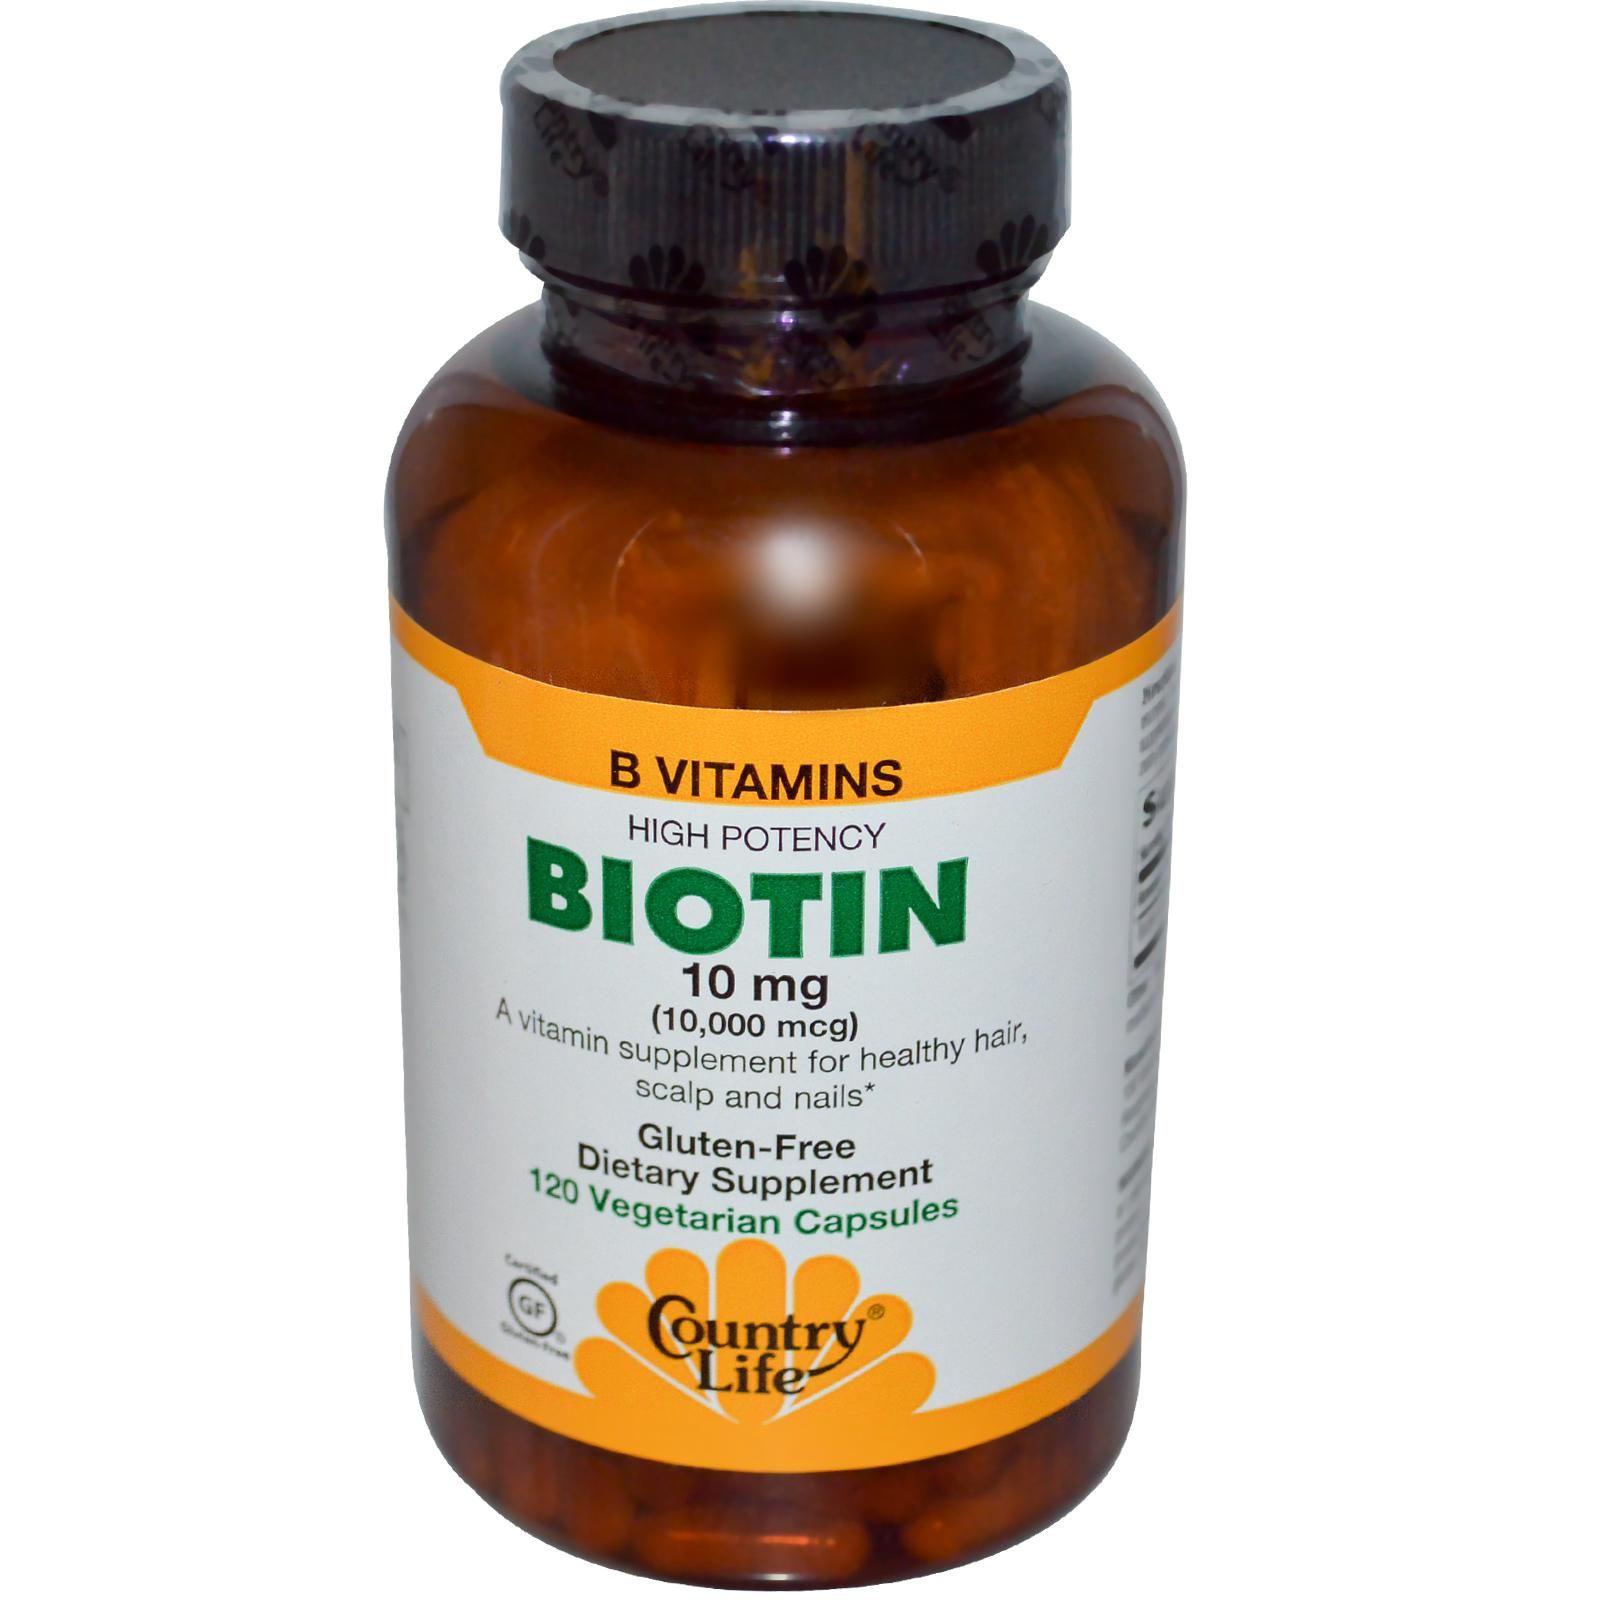 Country Life Biotin 10 Mg 120 Veggie Caps Discontinued Item